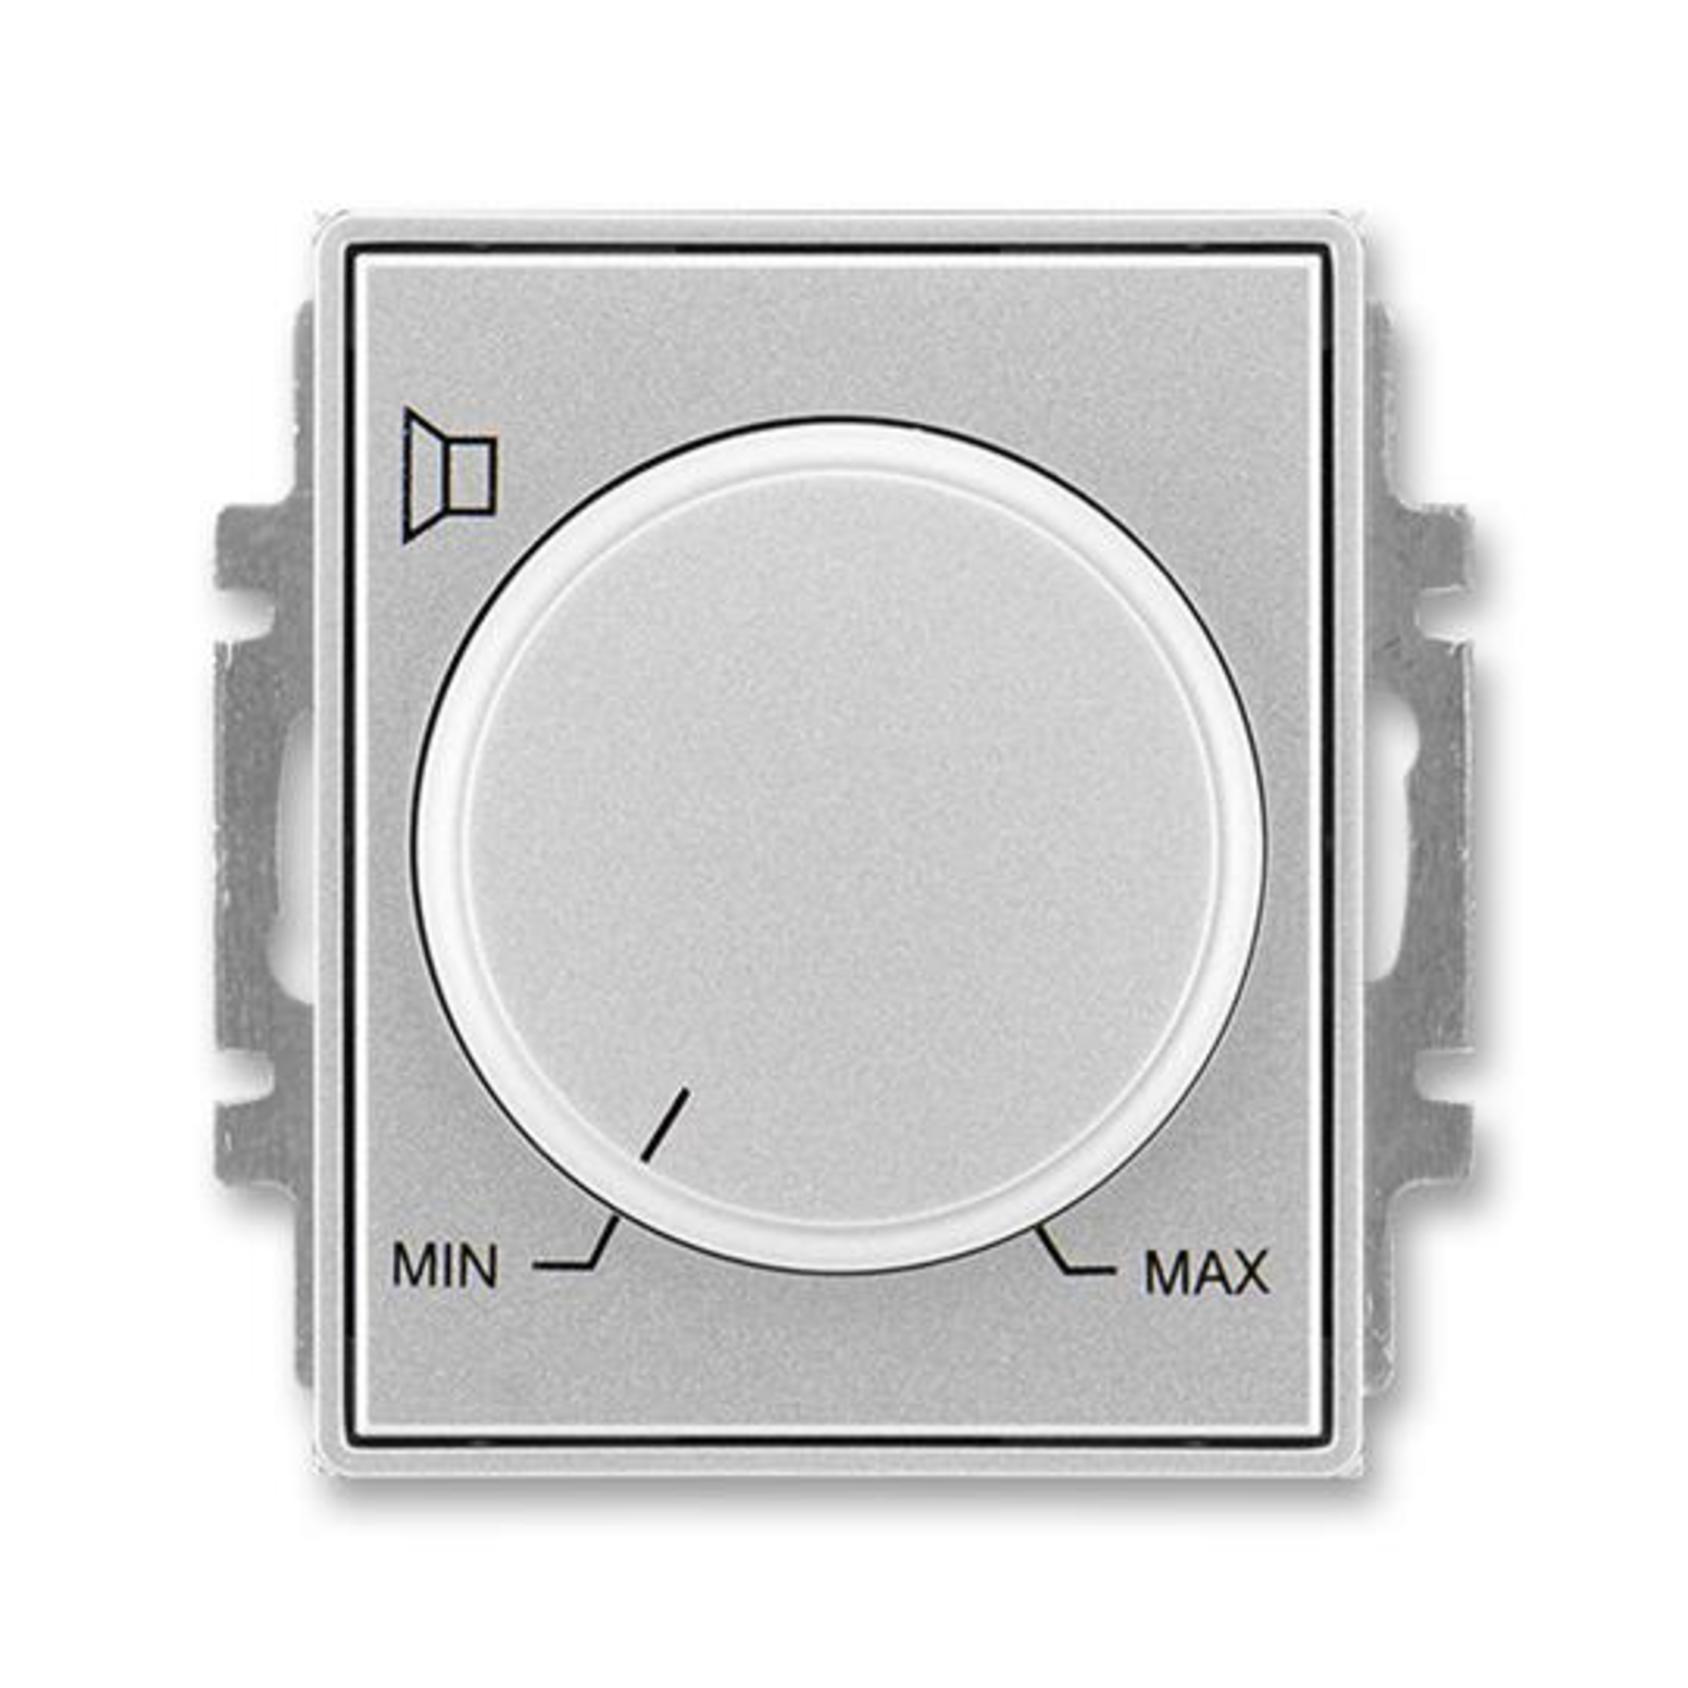 ABB 5016E-A10100 08 Time Regulátor hlasitosti 100 V, s krytem